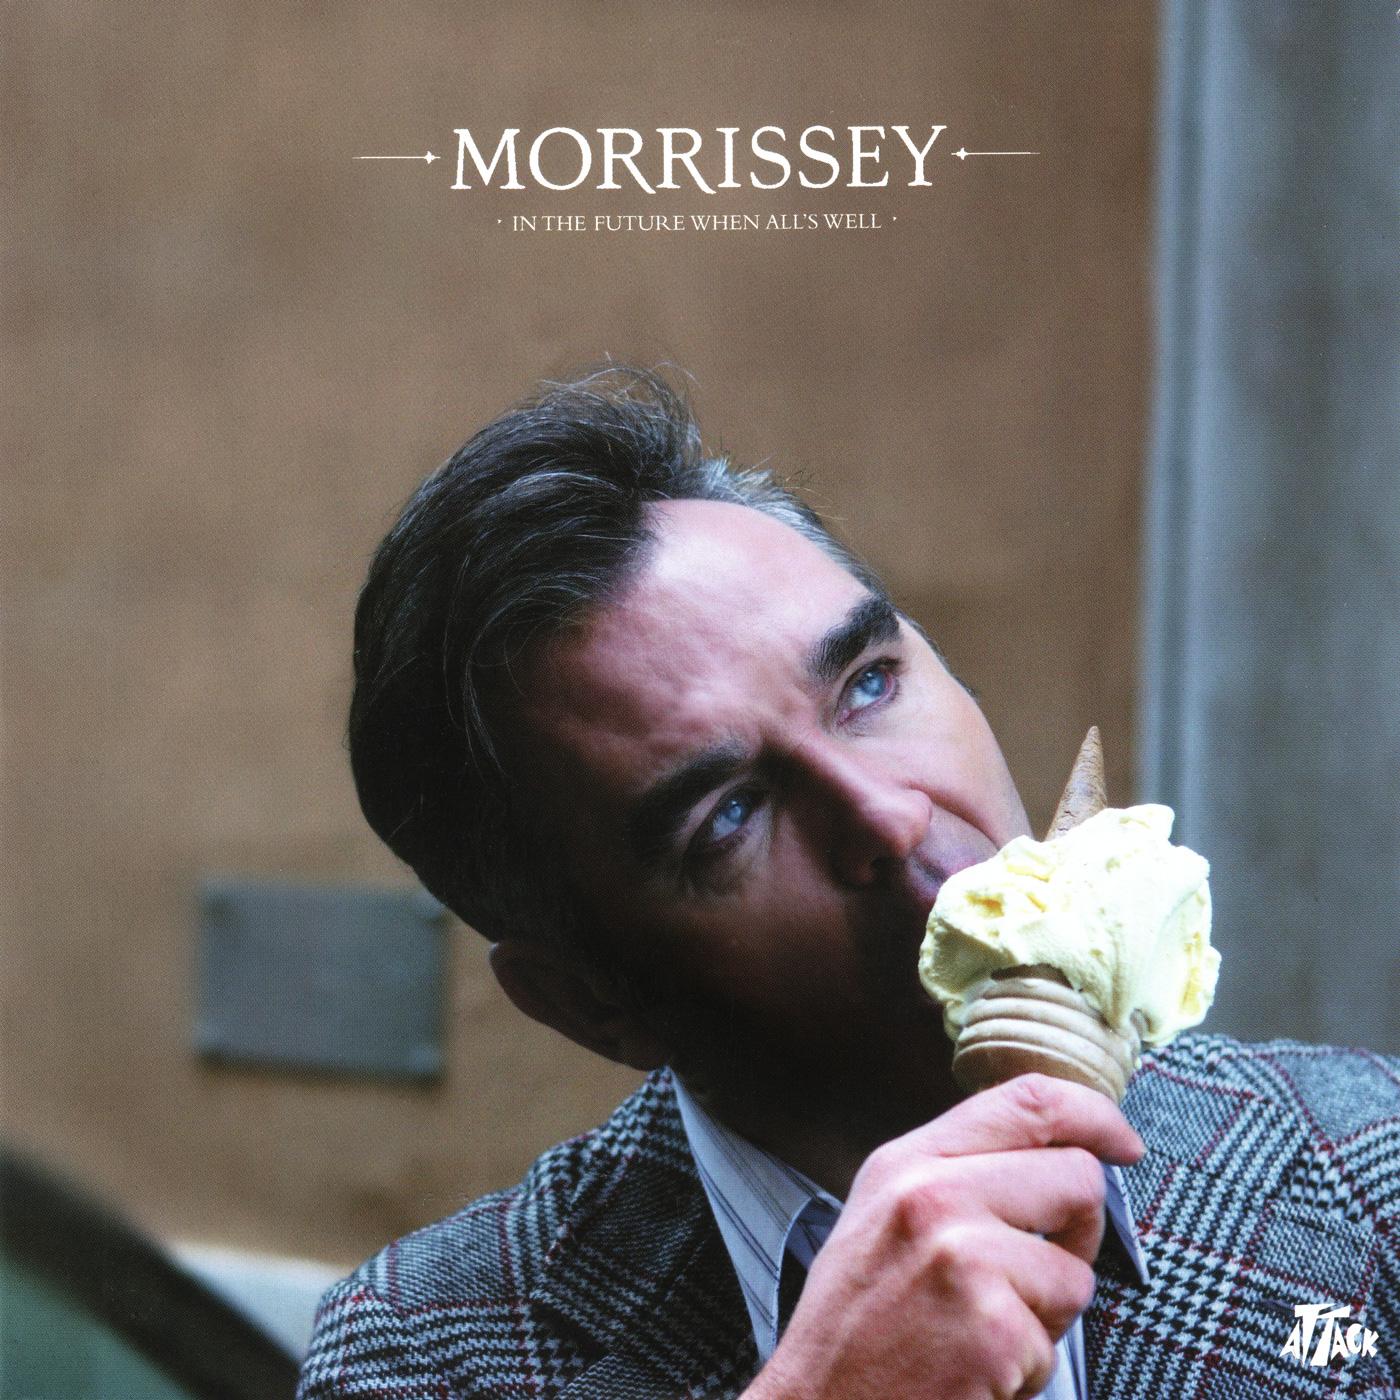 Morrissey Fabio Lovino Gelato (ii).jpg